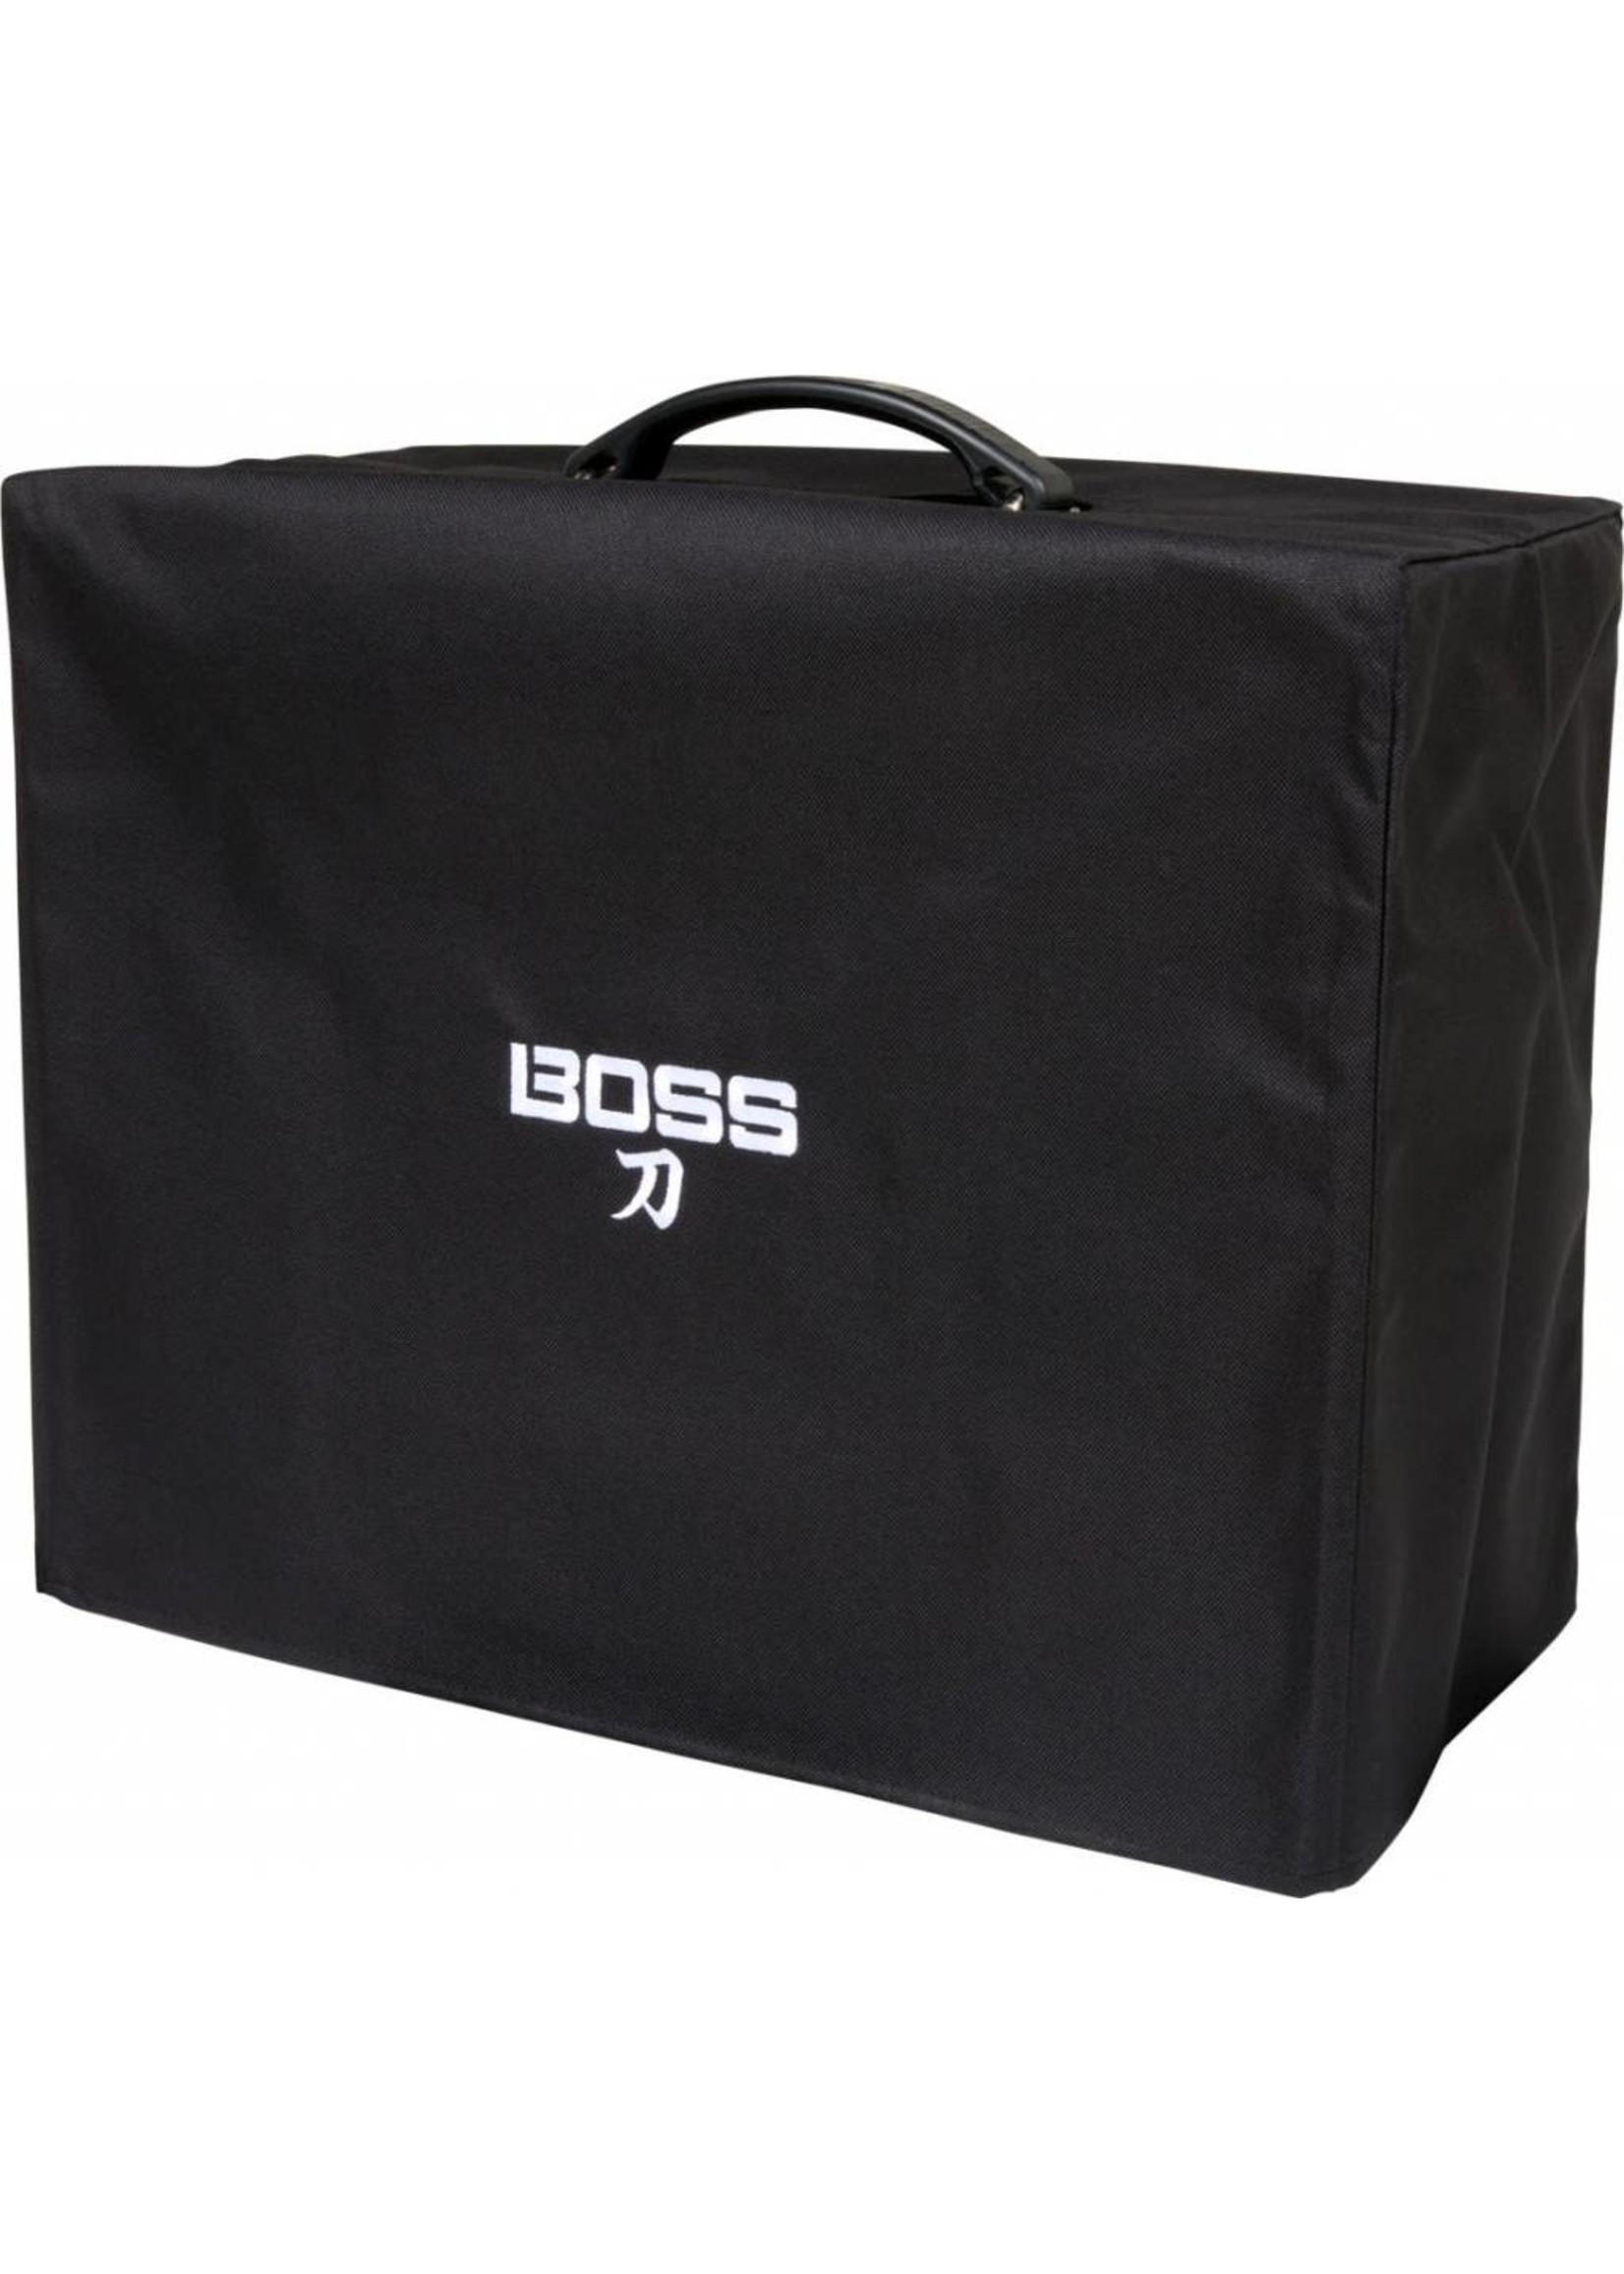 BOSS BAC-KTN50 BOSS